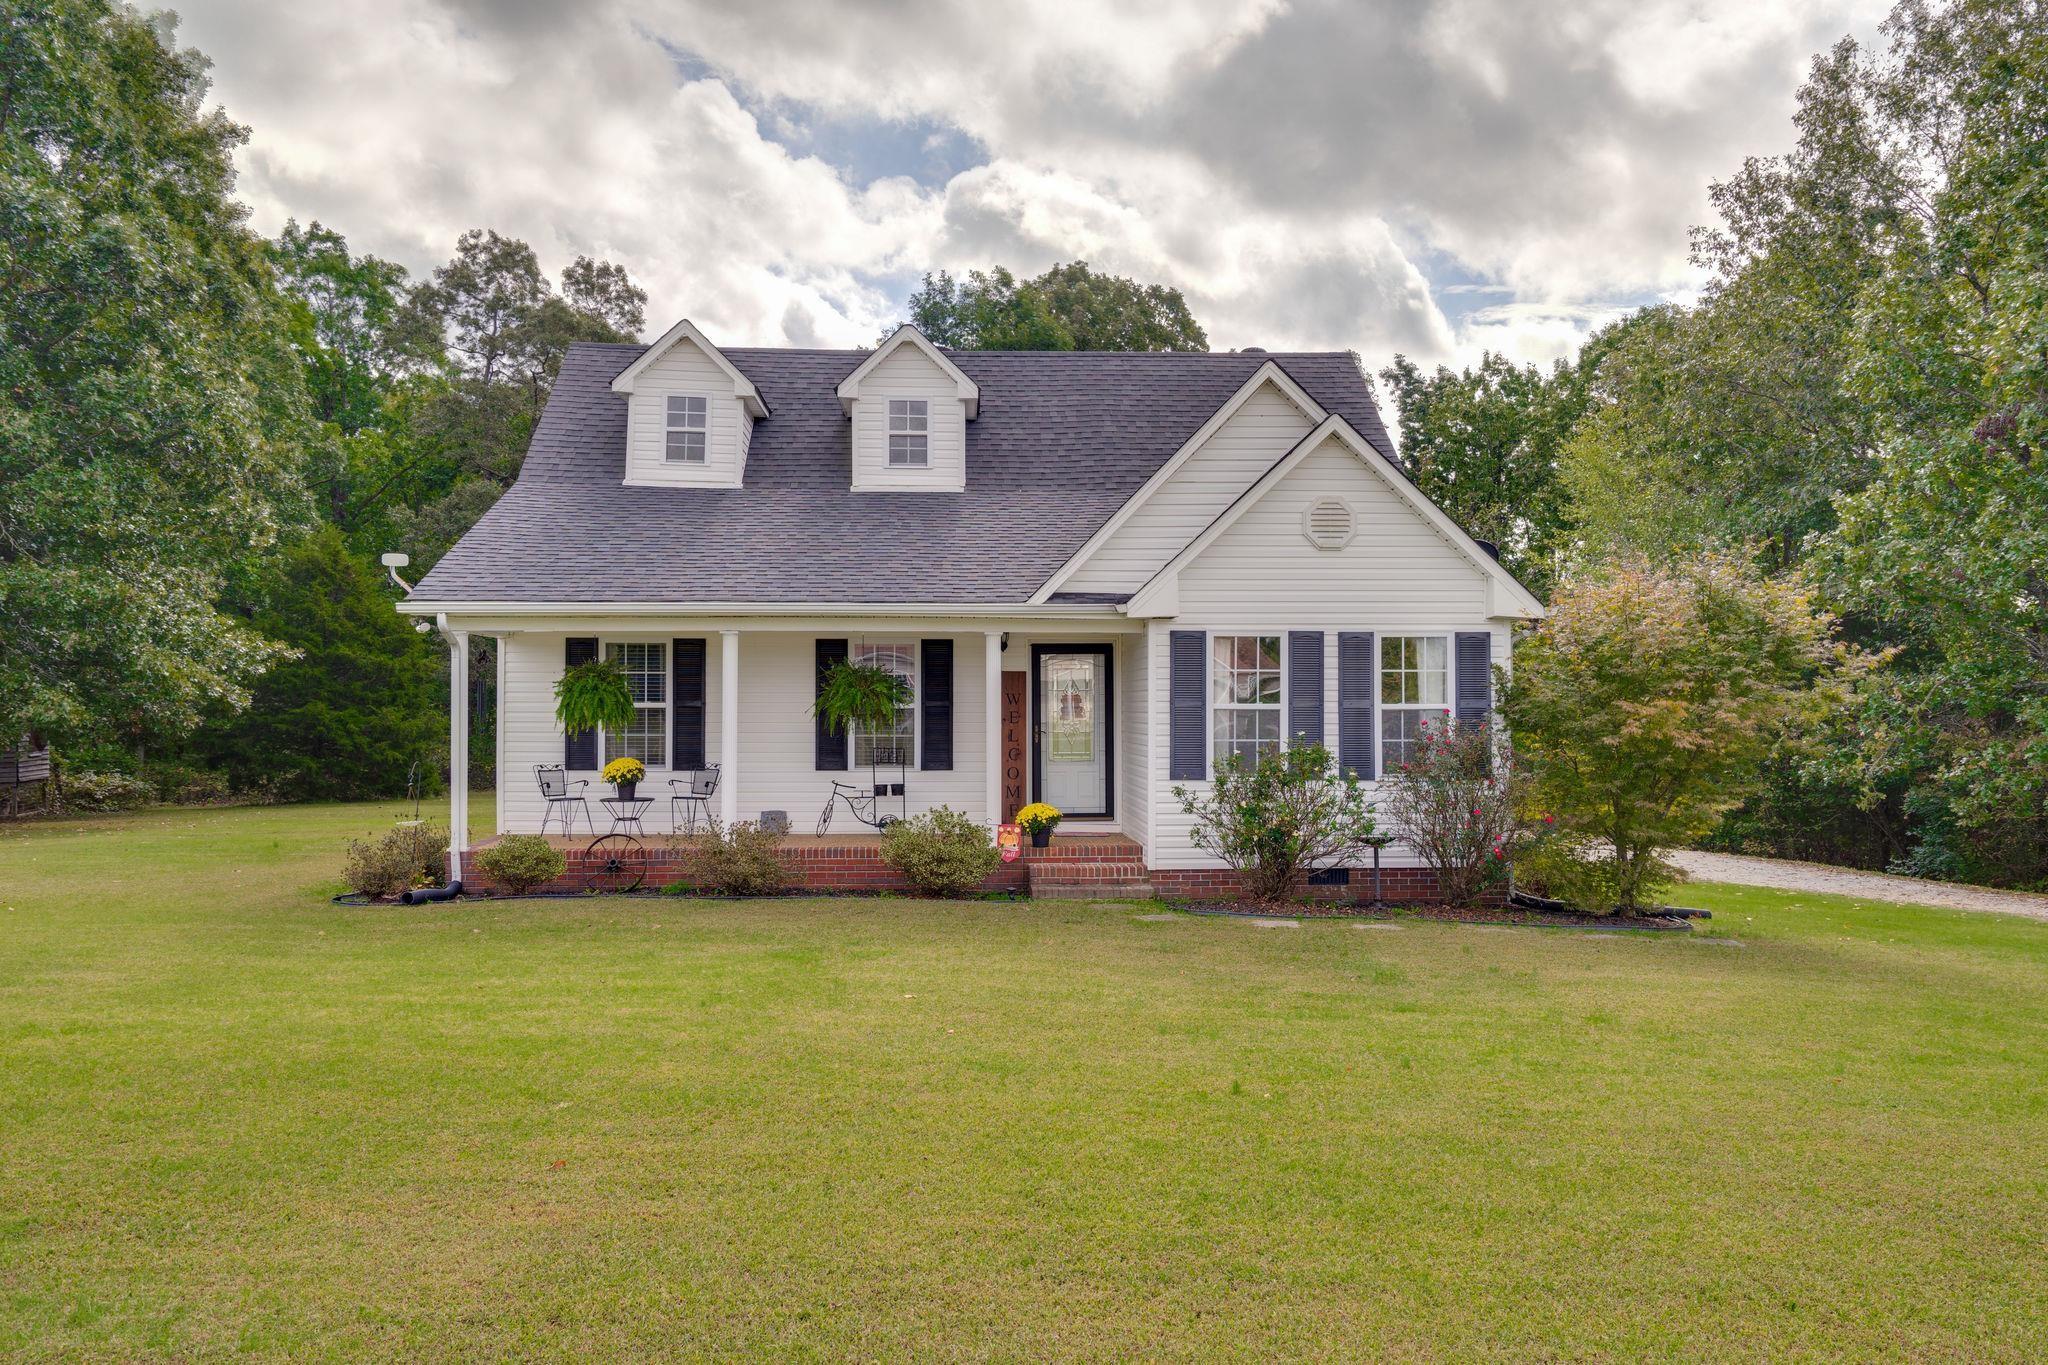 128 Commanche Dr, Hohenwald, TN 38462 - Hohenwald, TN real estate listing